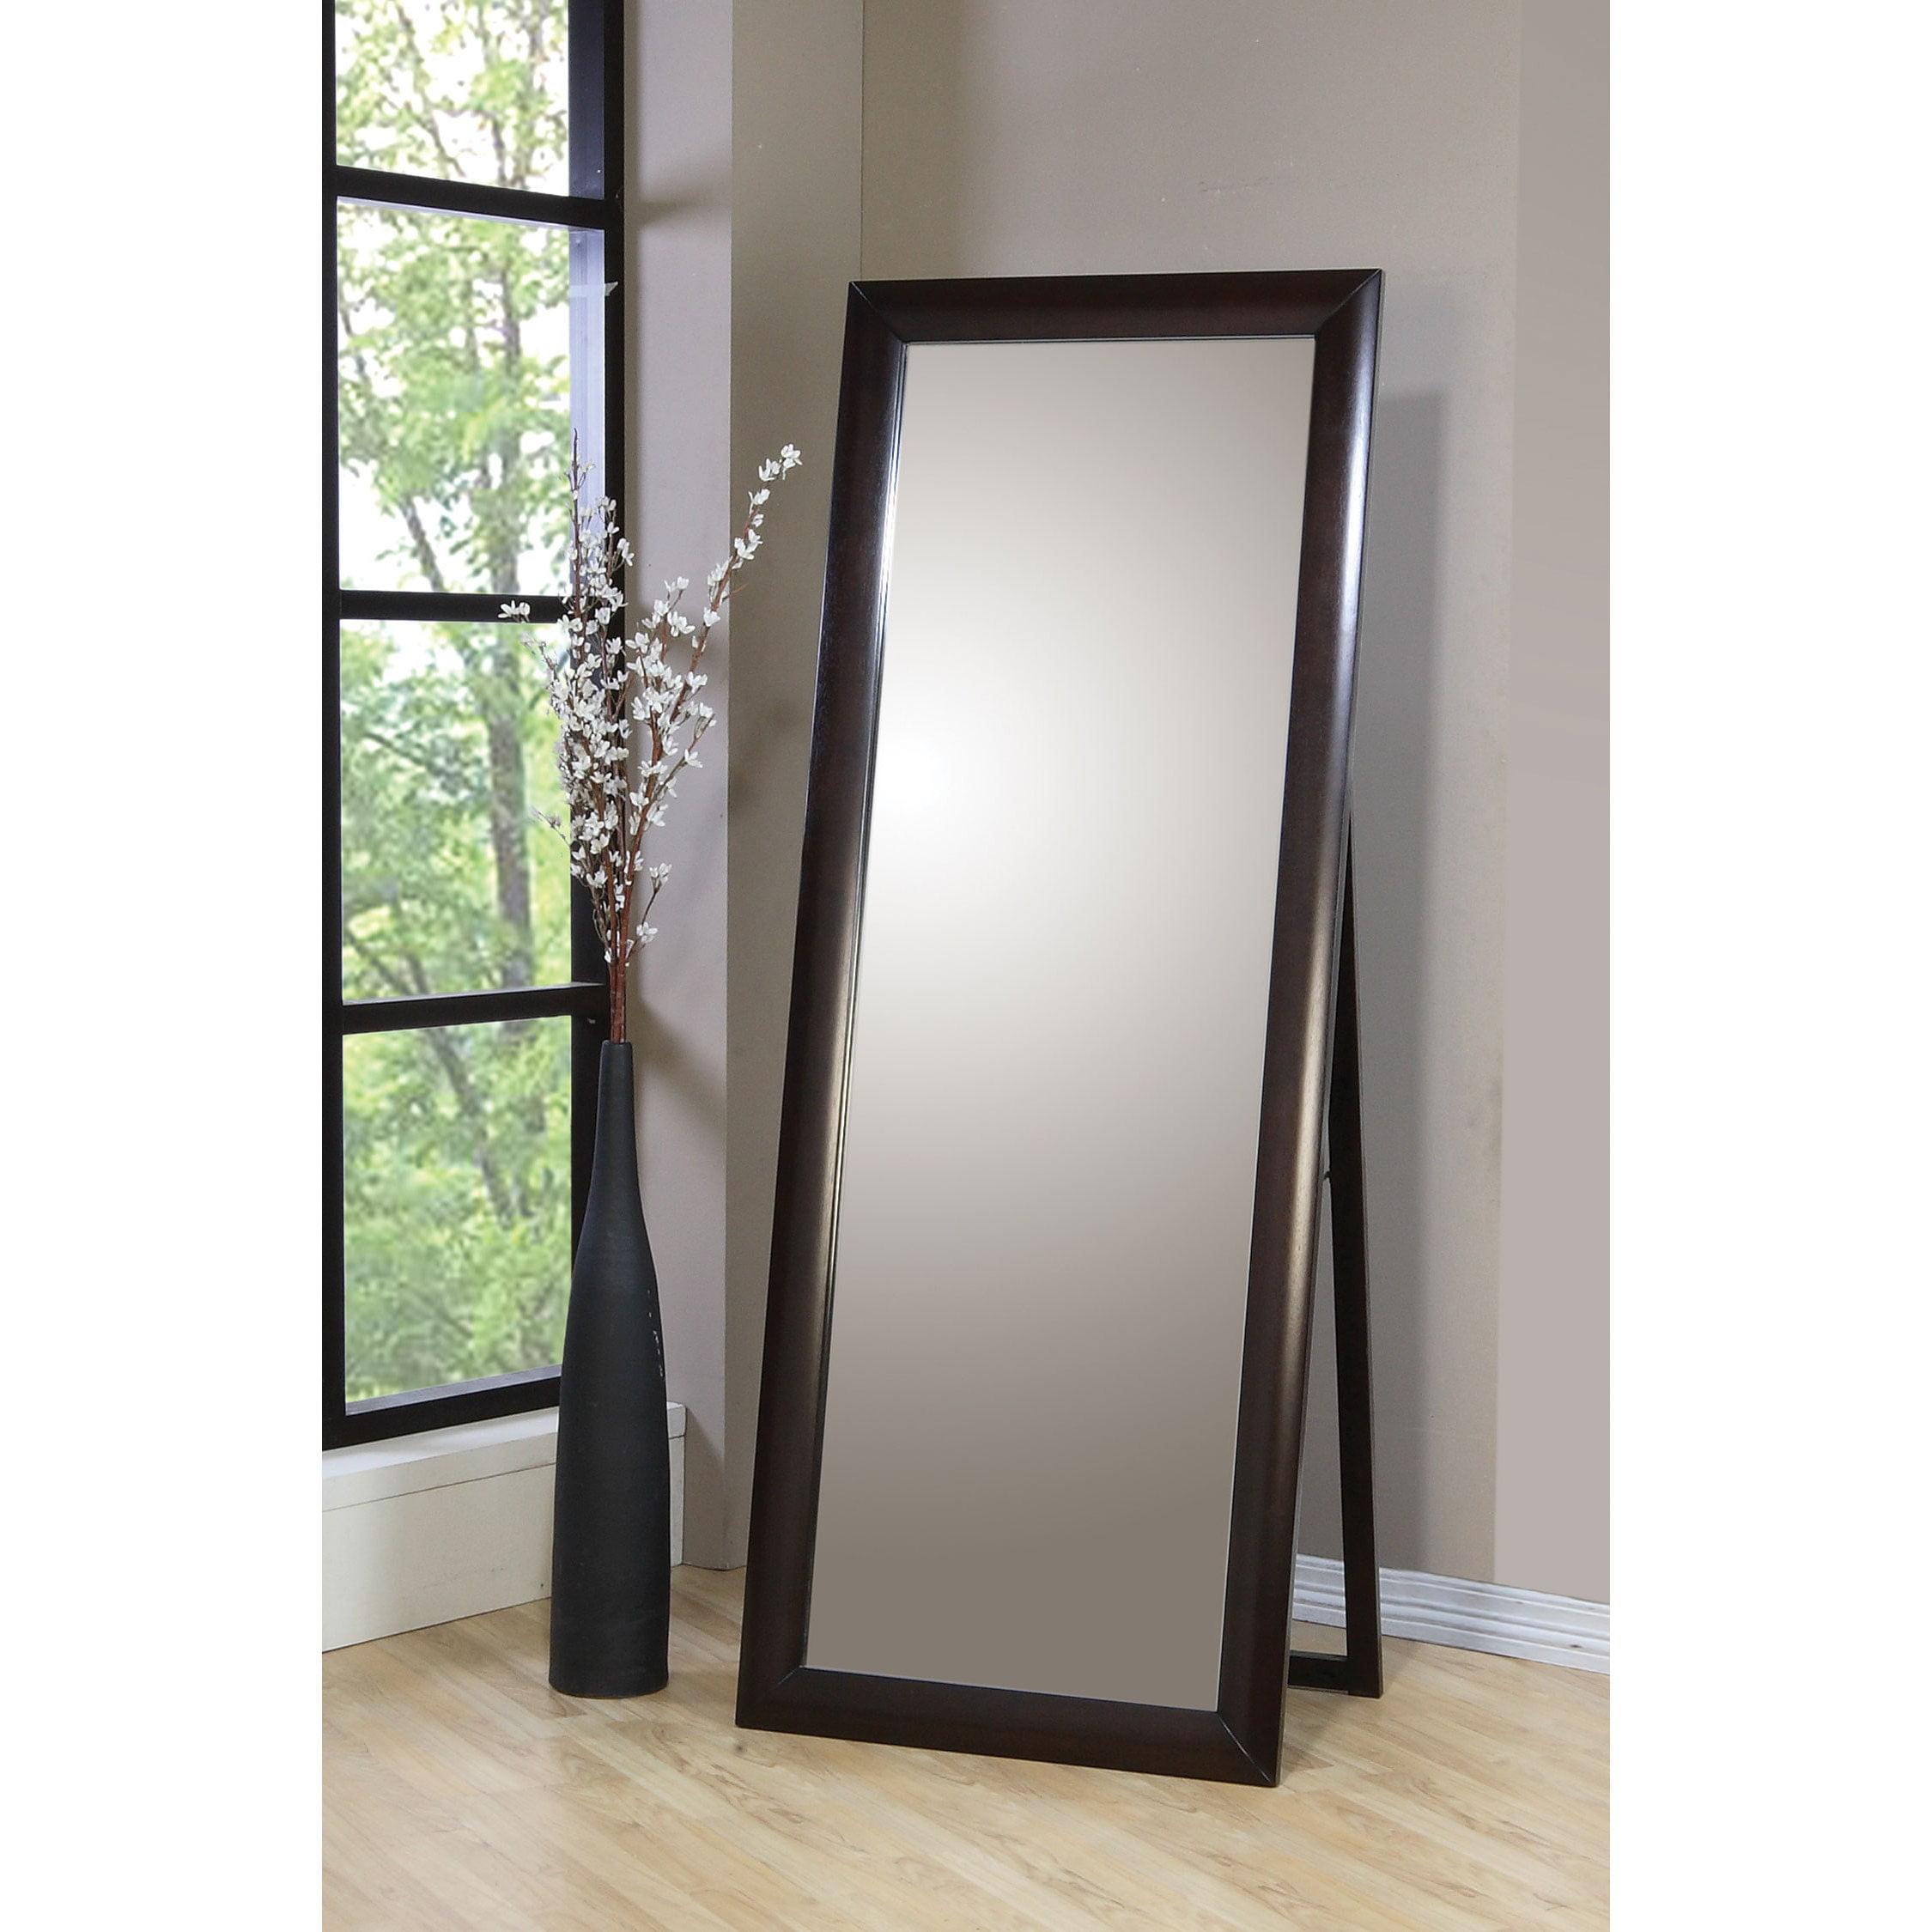 Coaster Furniture Phoenix Standing Floor Mirror 29.75W x 77H in. by Coaster